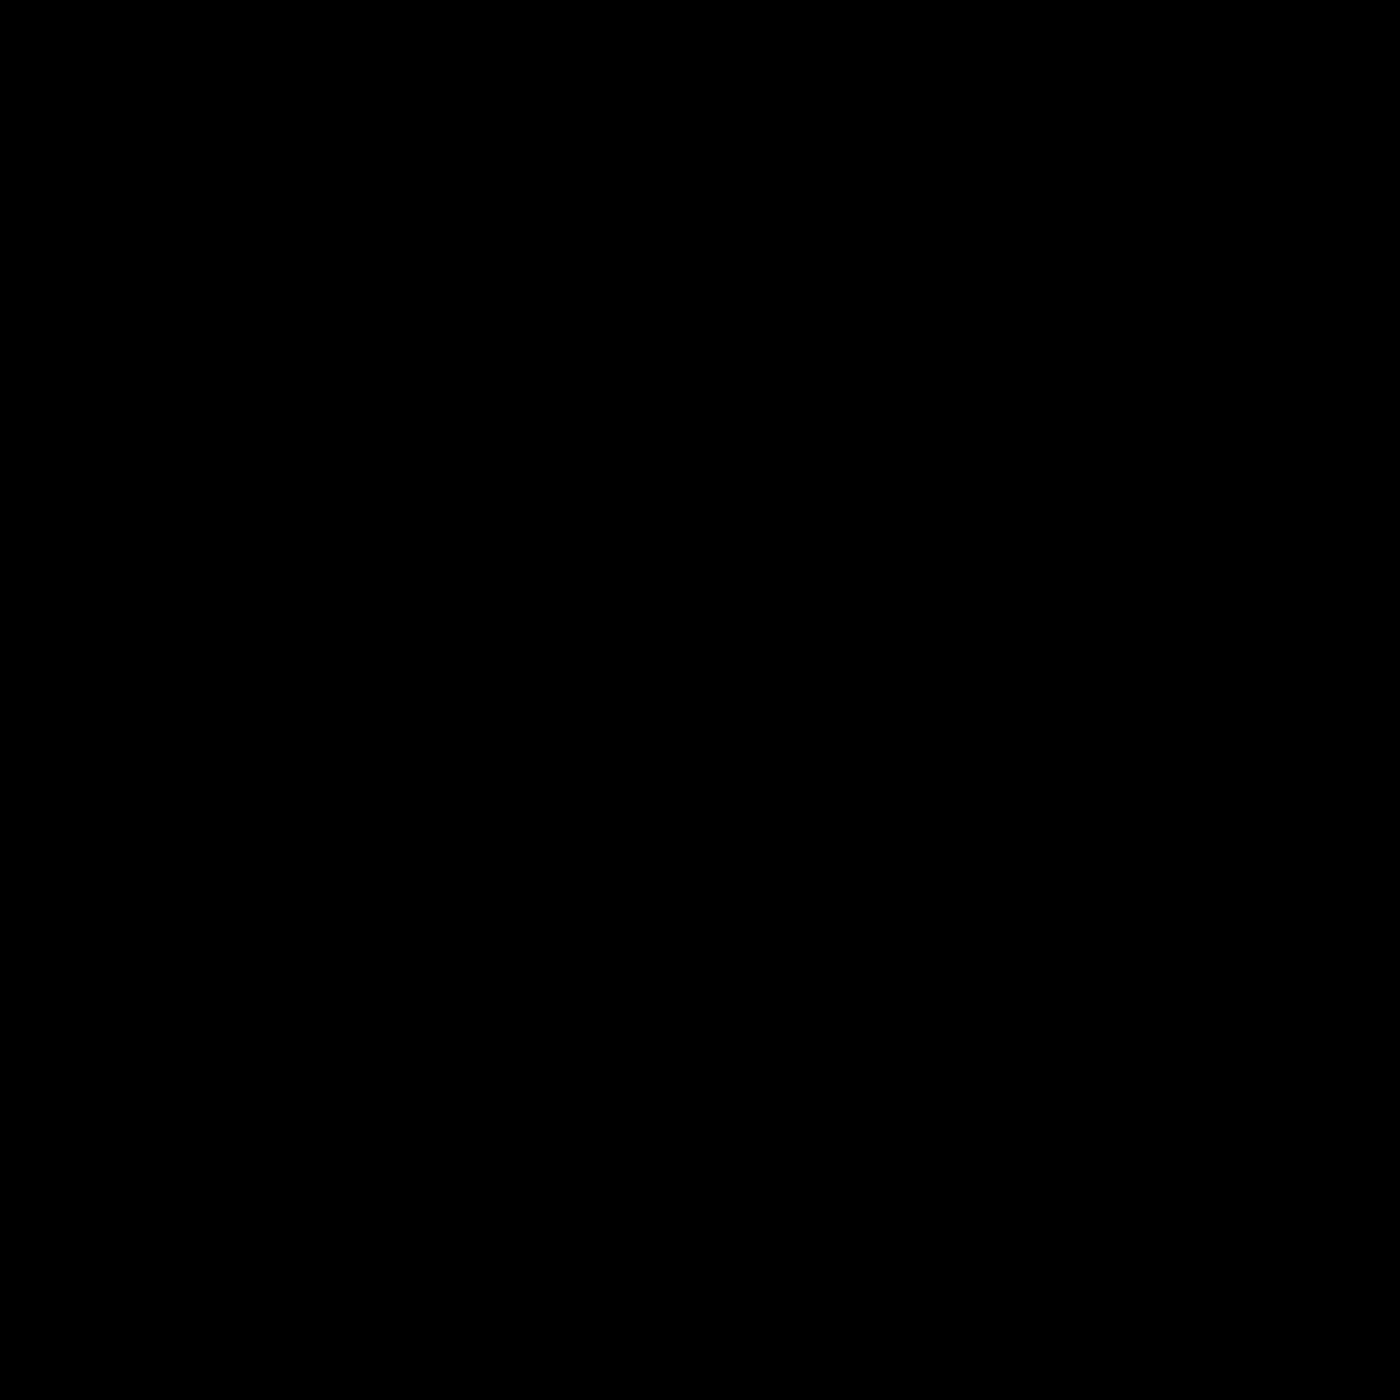 sra-logo-png-transparent.png